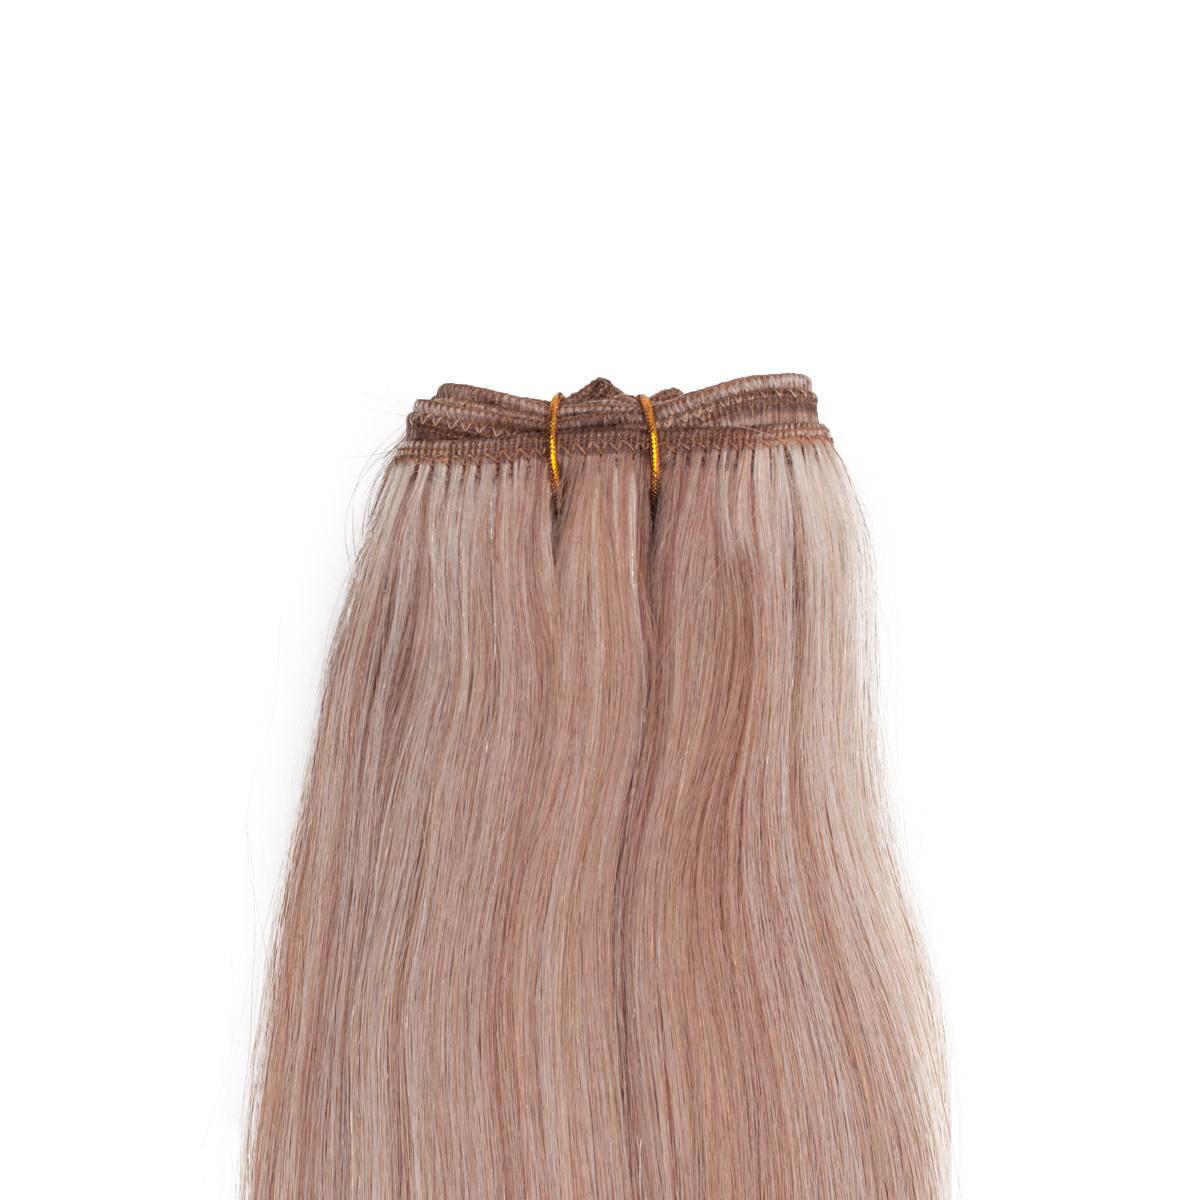 Hair Weft M7.3/10.8 Cendre Ash Blonde Mix 50 cm